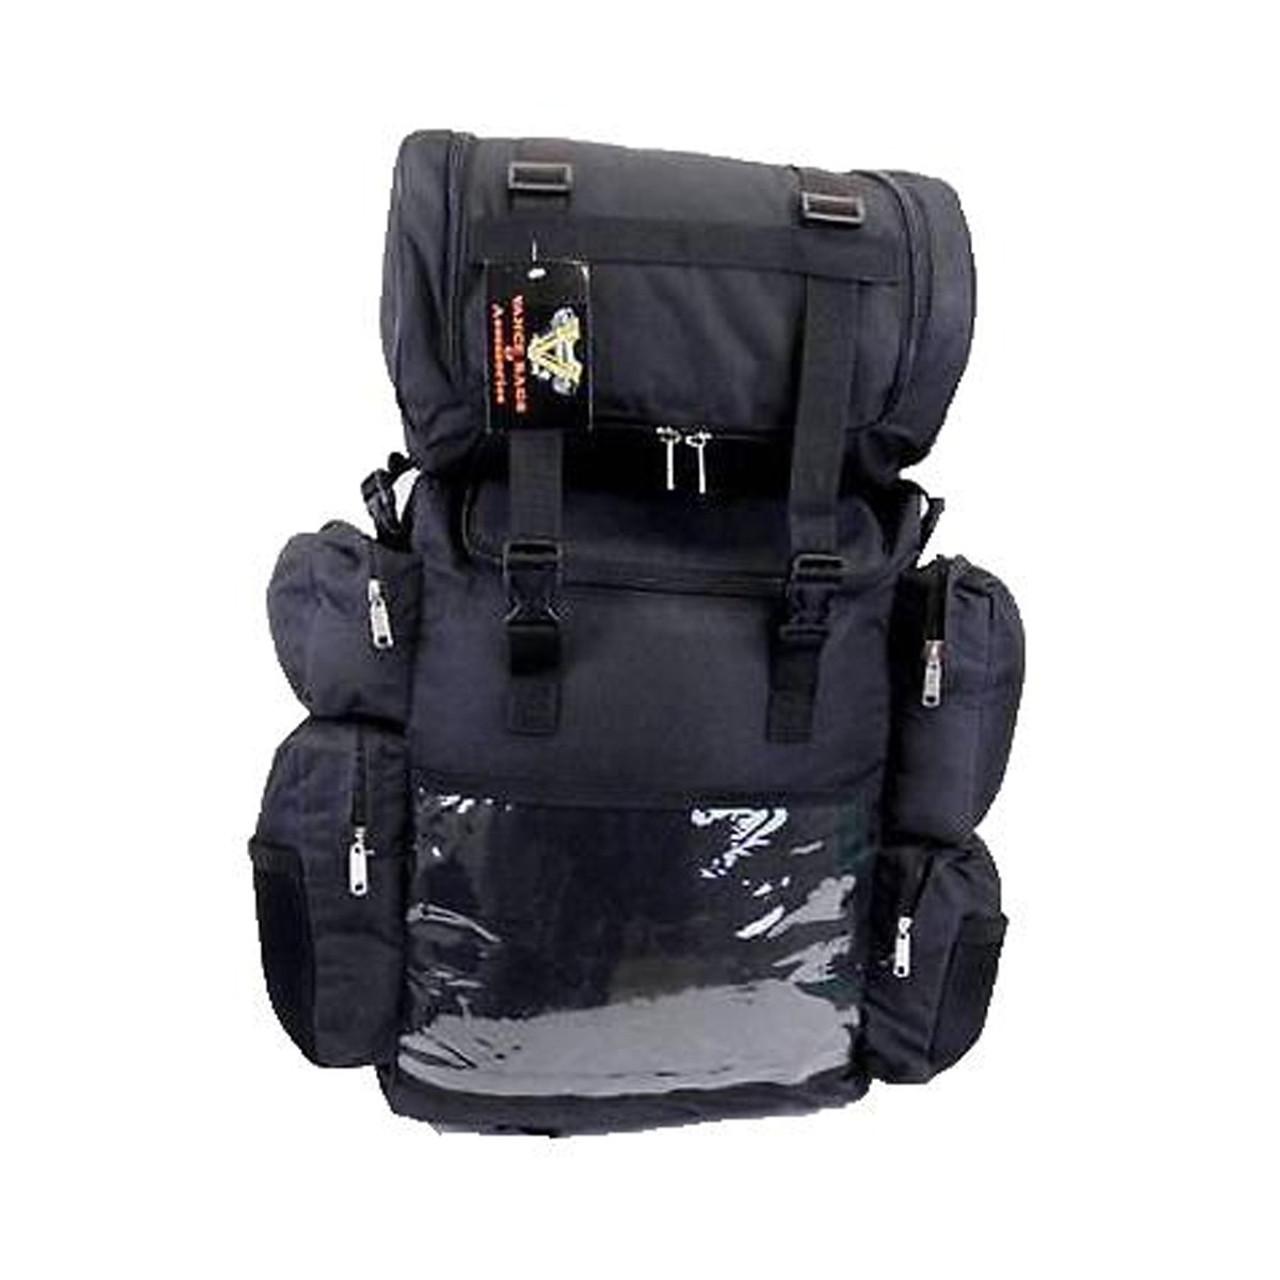 Vance VS324 Black Nylon Large Motorcycle Travel Luggage Sissy Bar Bag - Team Motorcycle